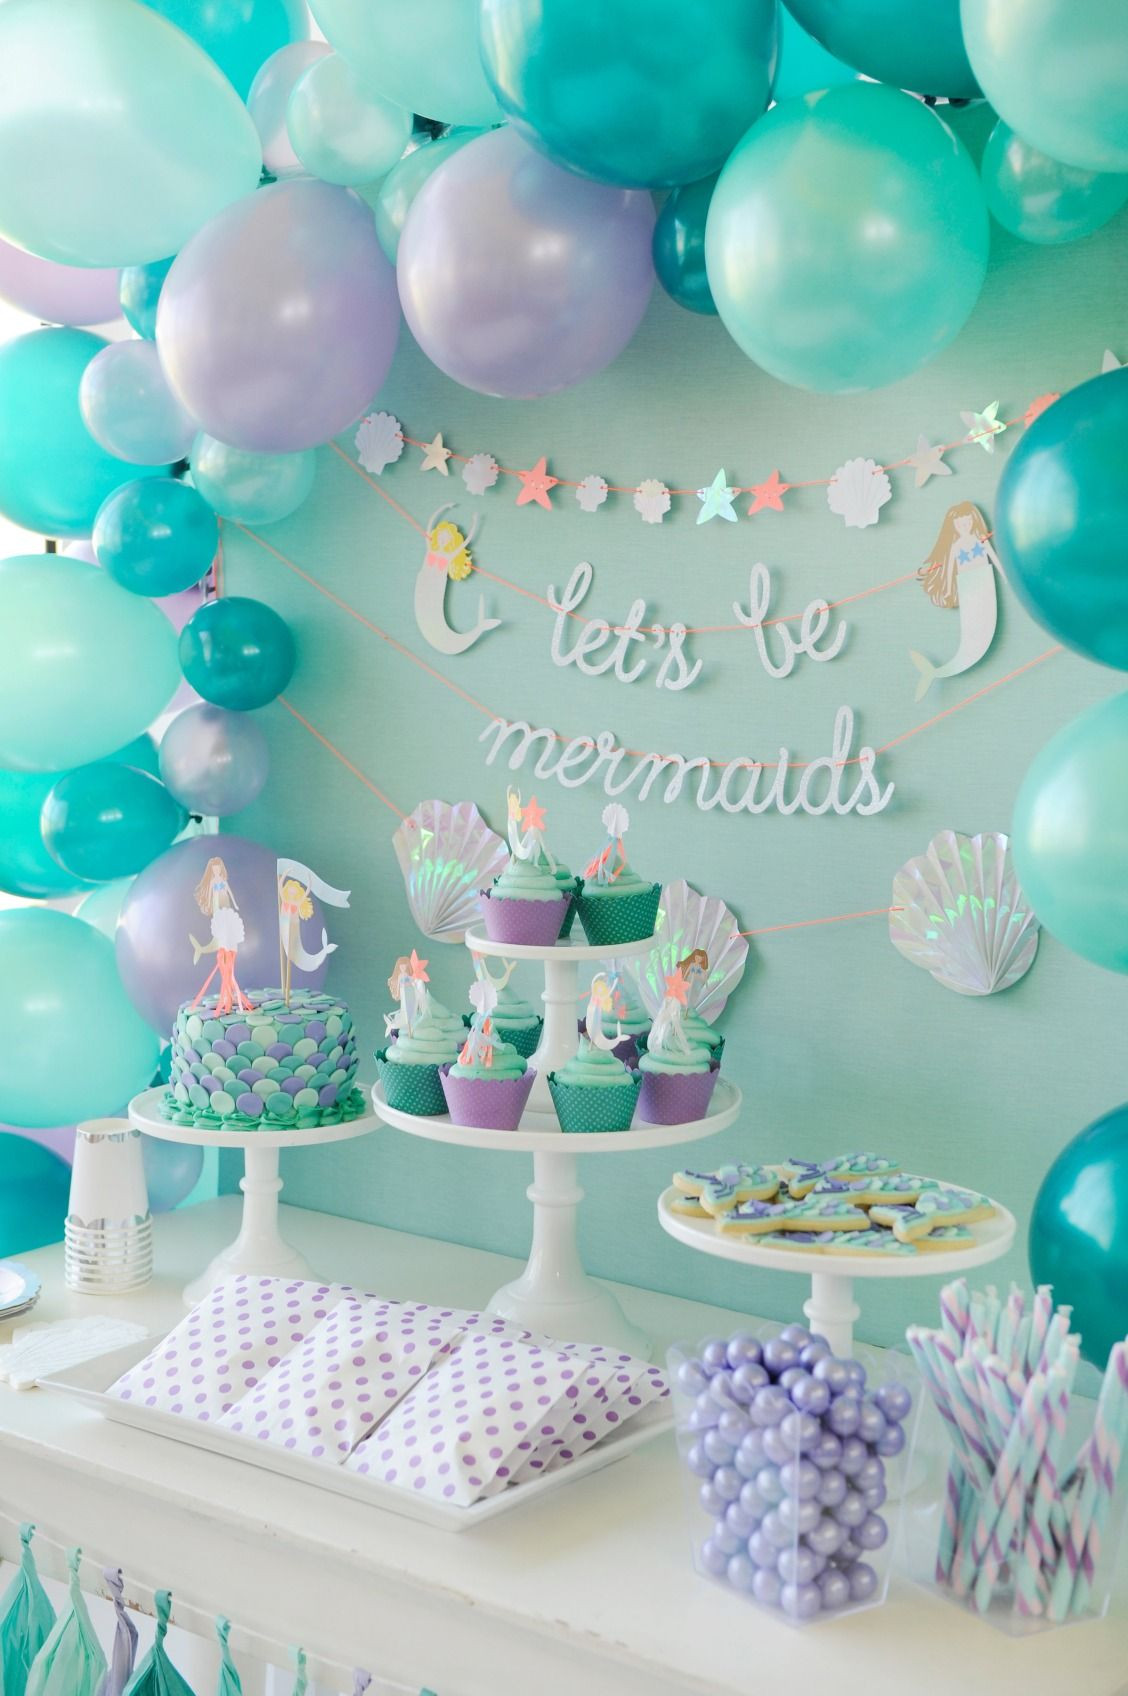 Mermaid Birthday Party Decoration Ideas  Single Post Children s Birthday Party